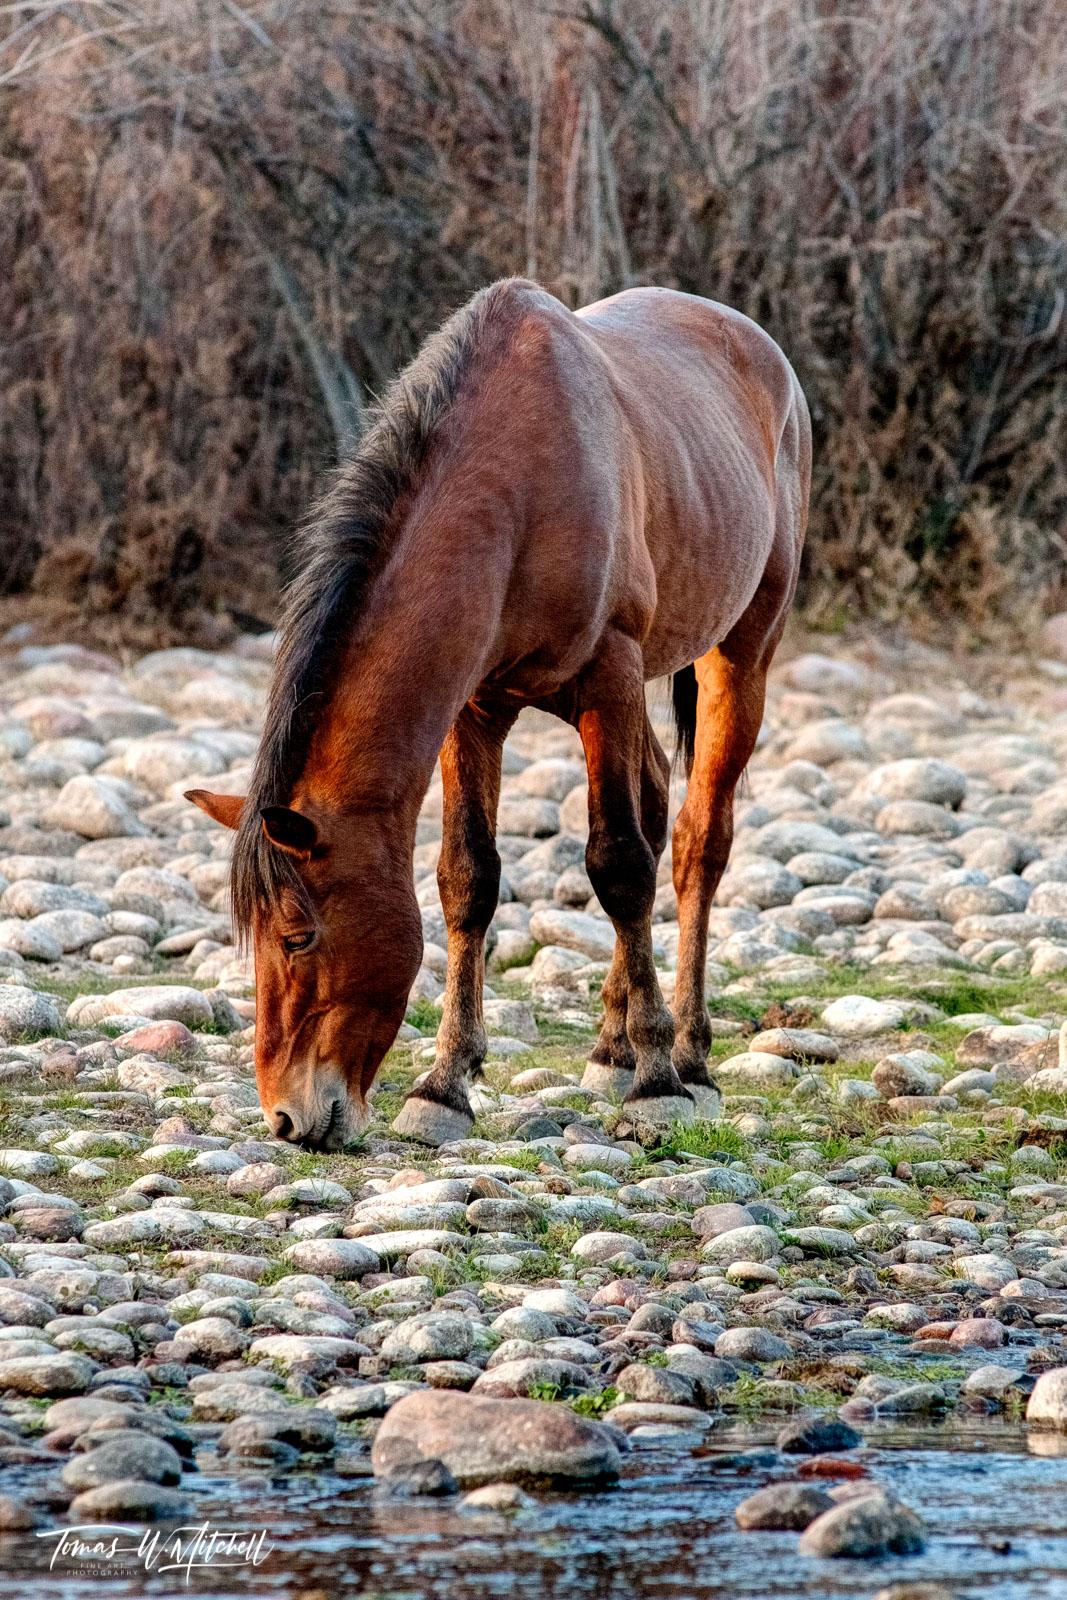 limited edition, fine art, prints, salt river, arizona, mustang, horses, stallion, photograph, , photo